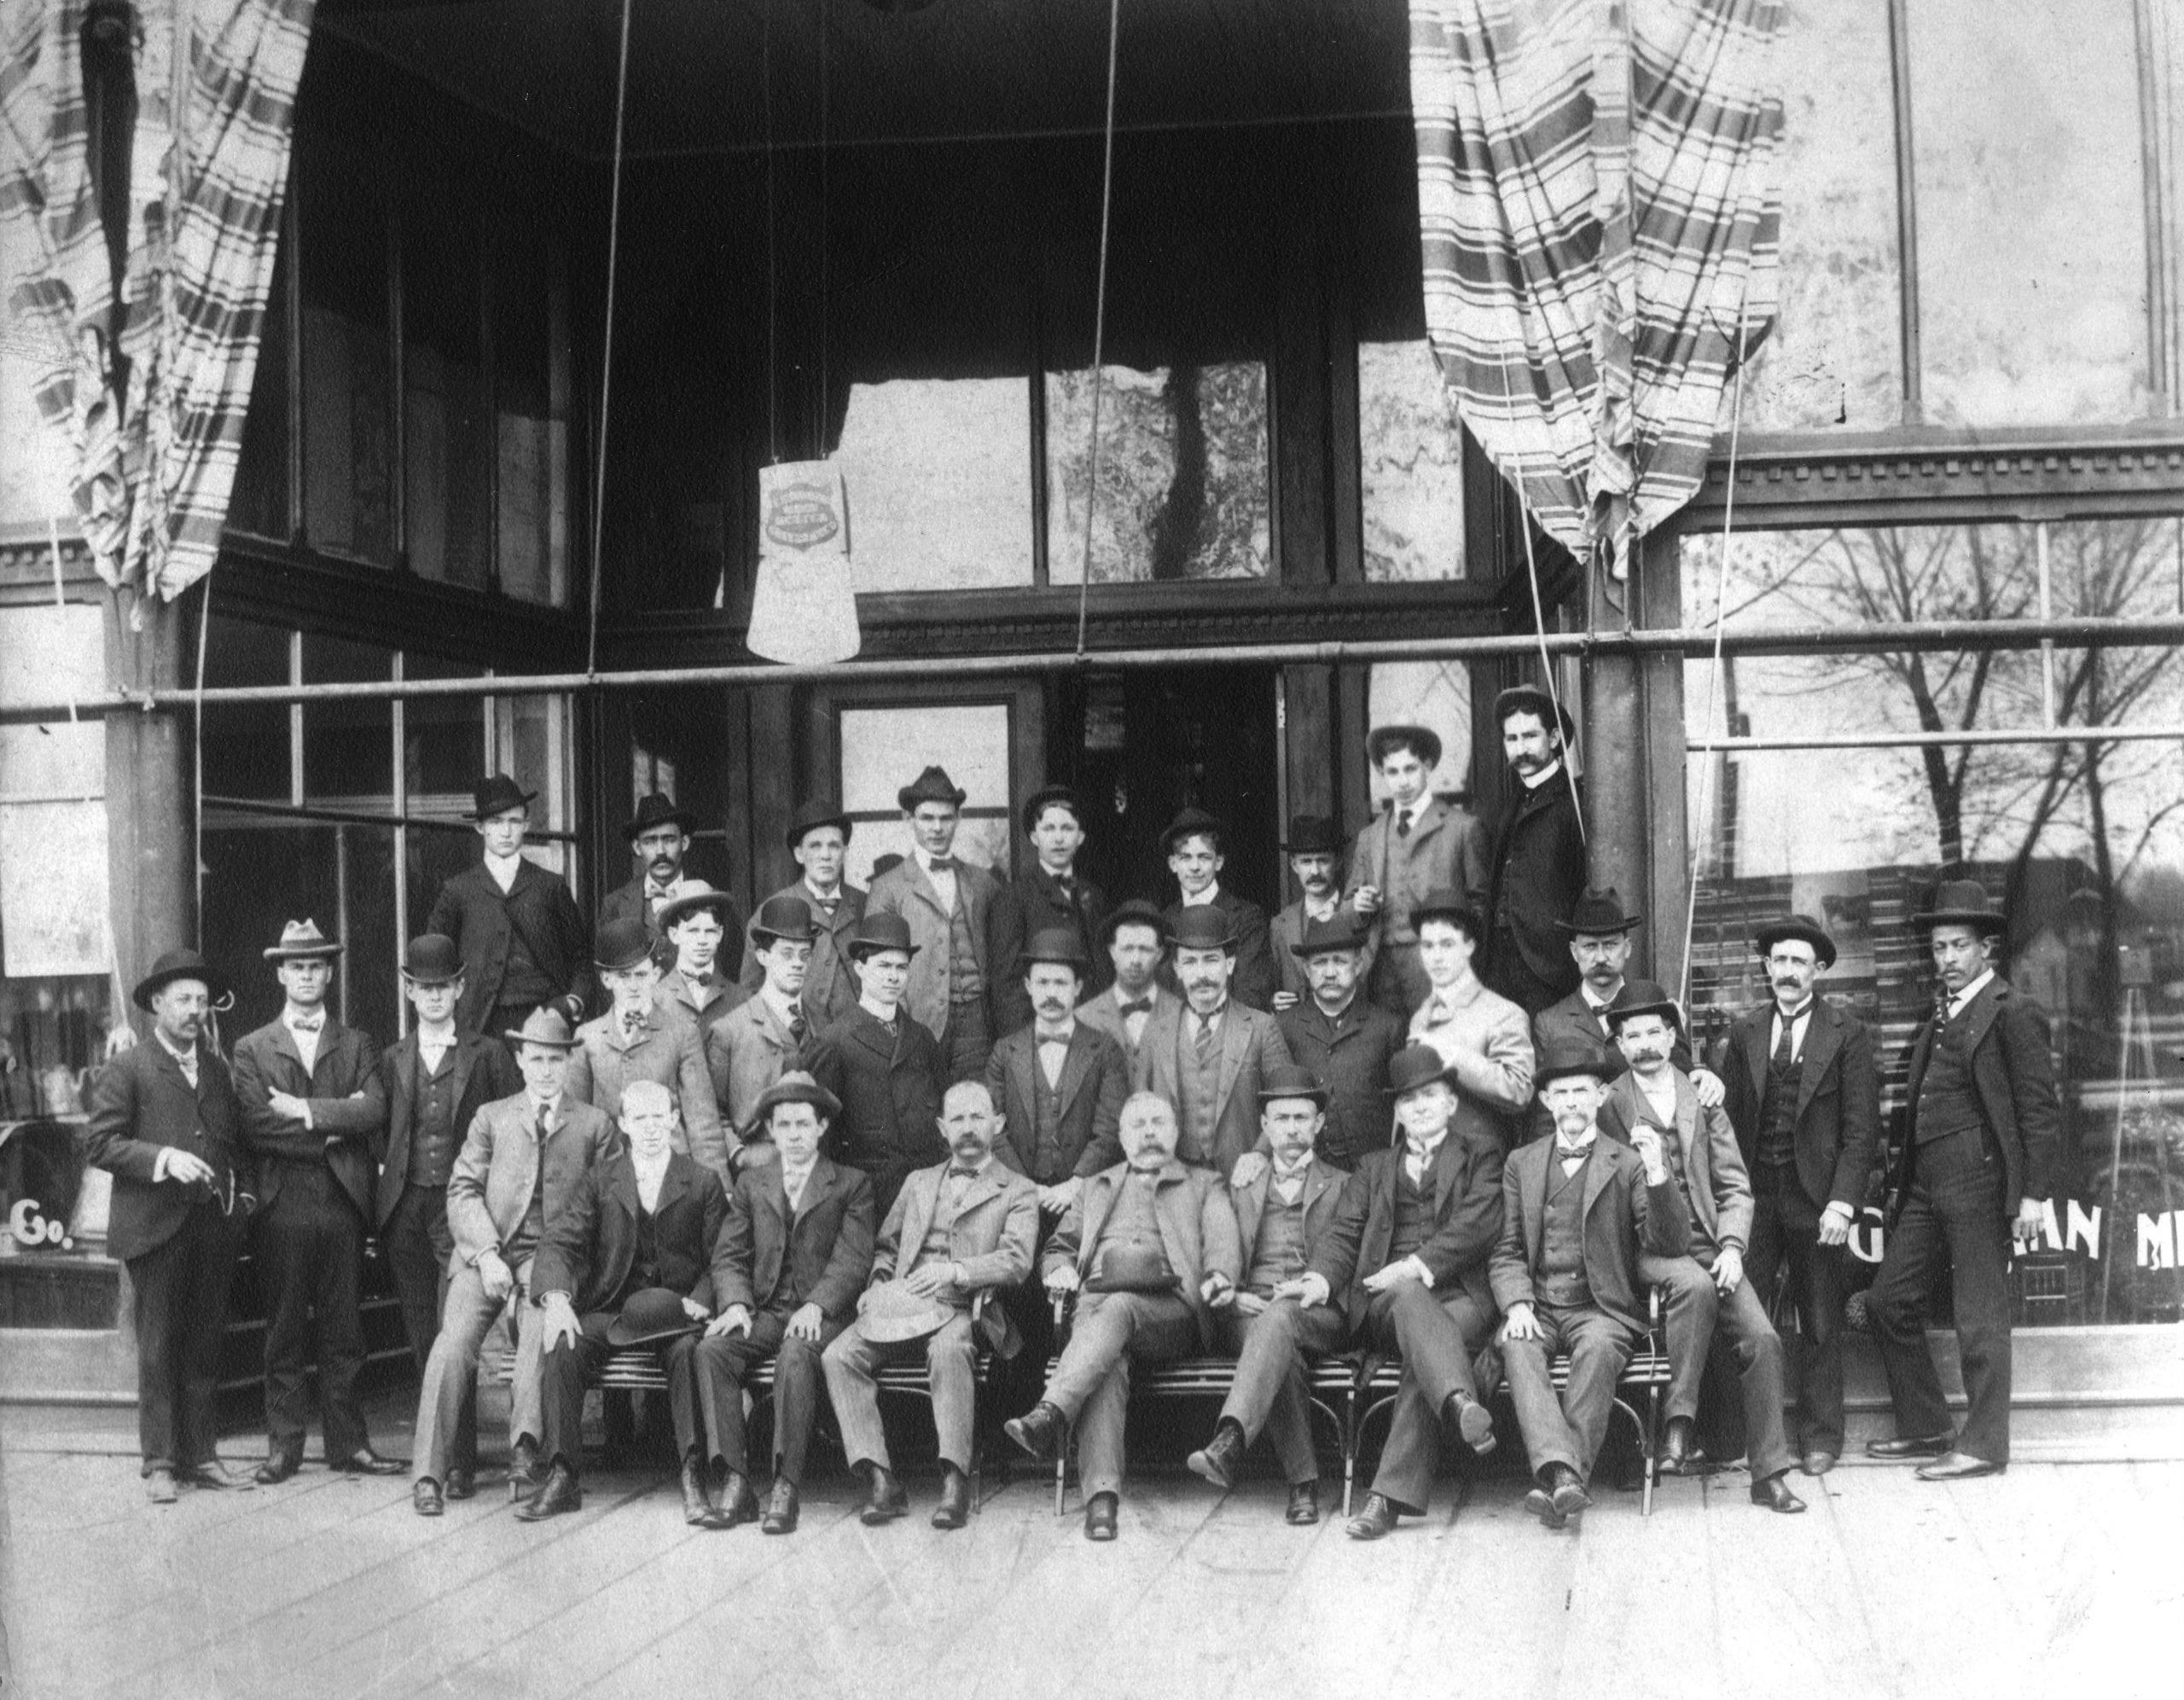 1909 – Wolff Goldman Department Store